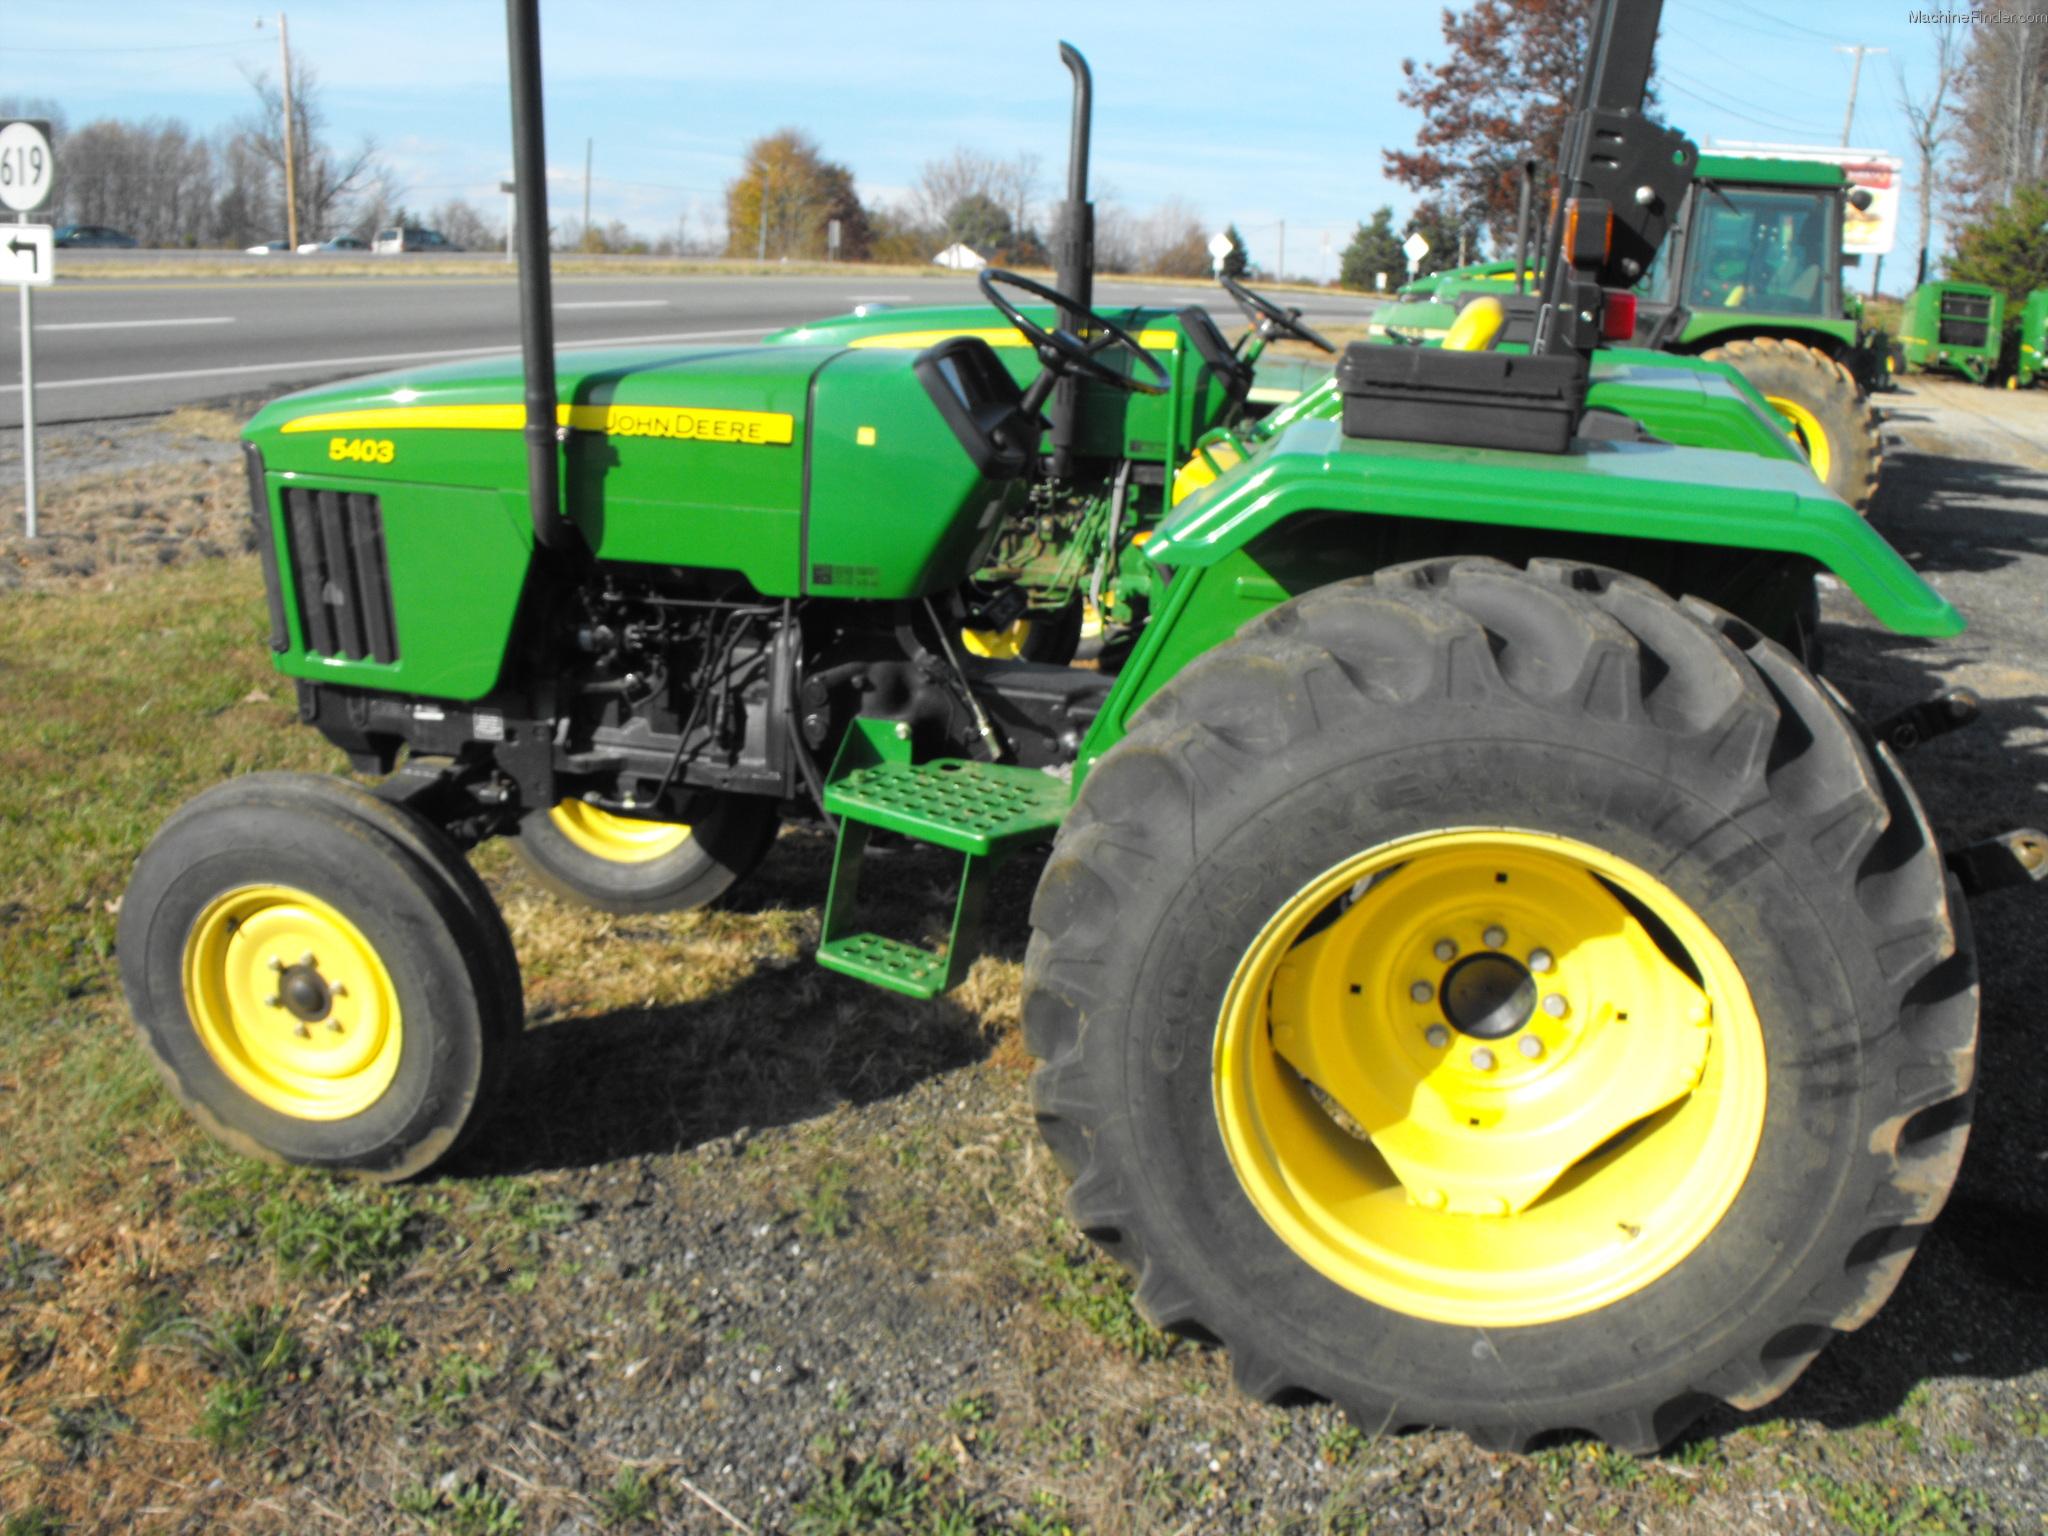 John Deere 5403 Farm Tractor Tractors 5525 Wiring Diagram